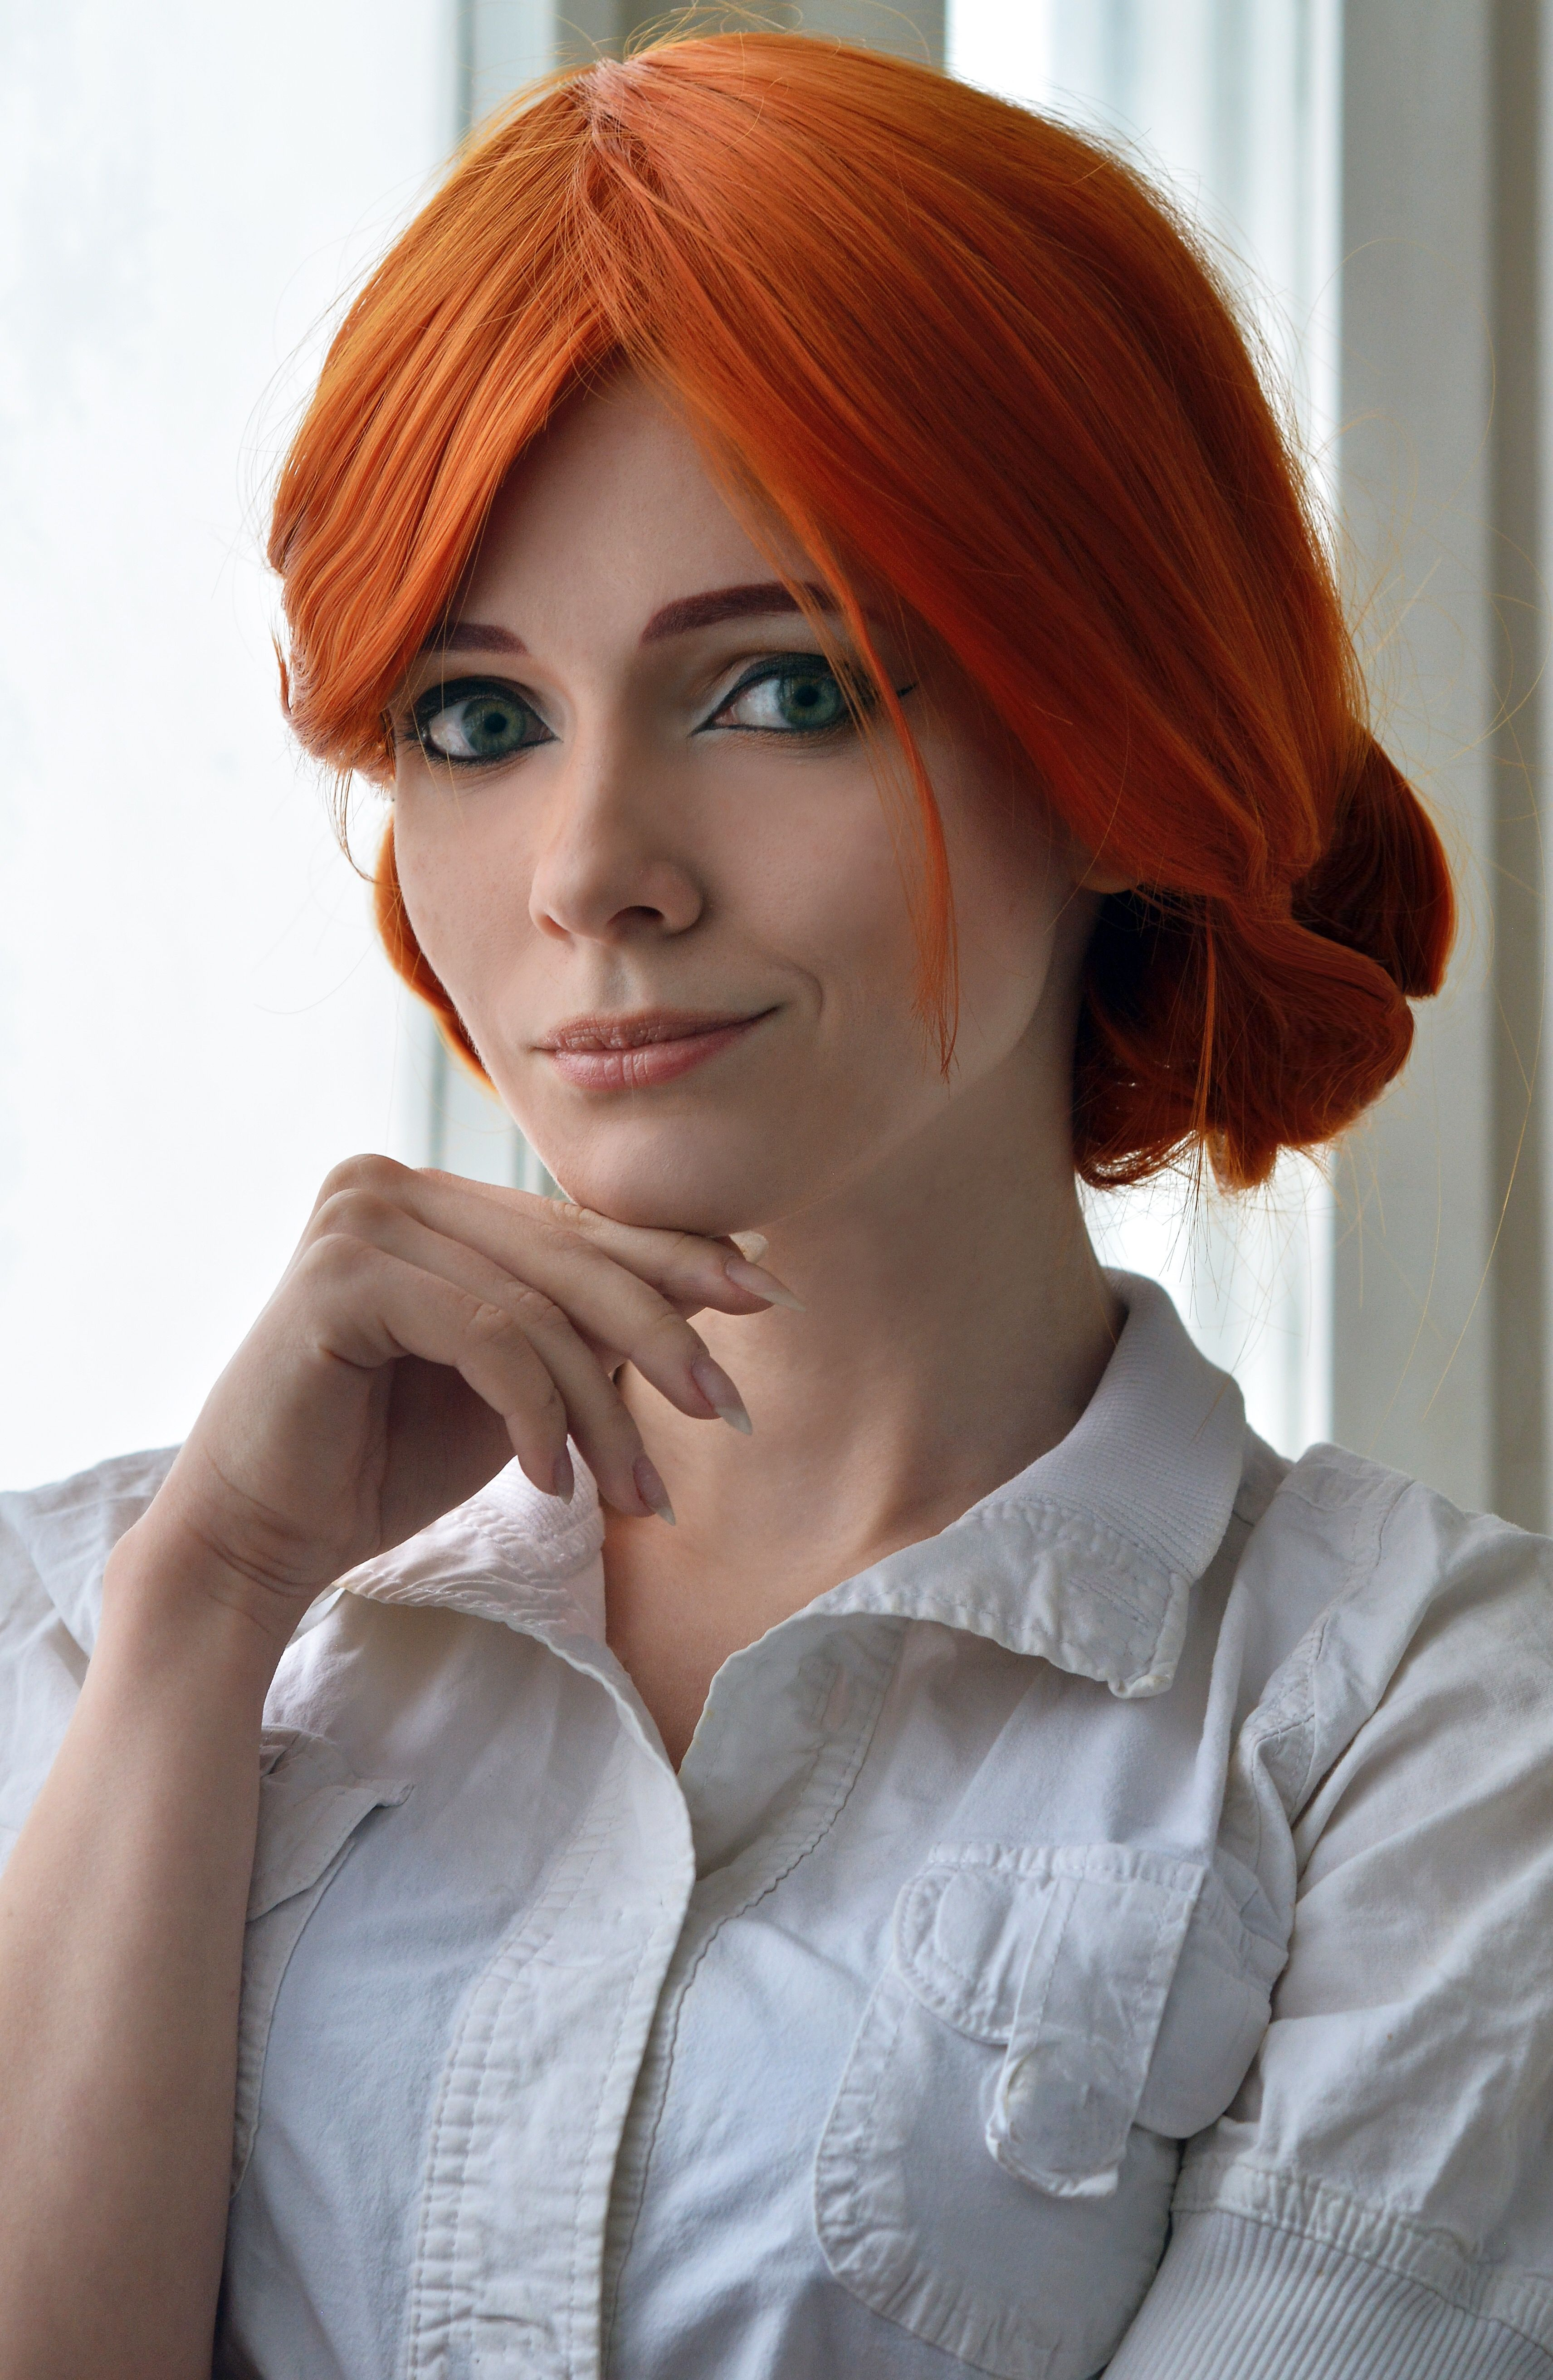 xenia shelkovskaya nude